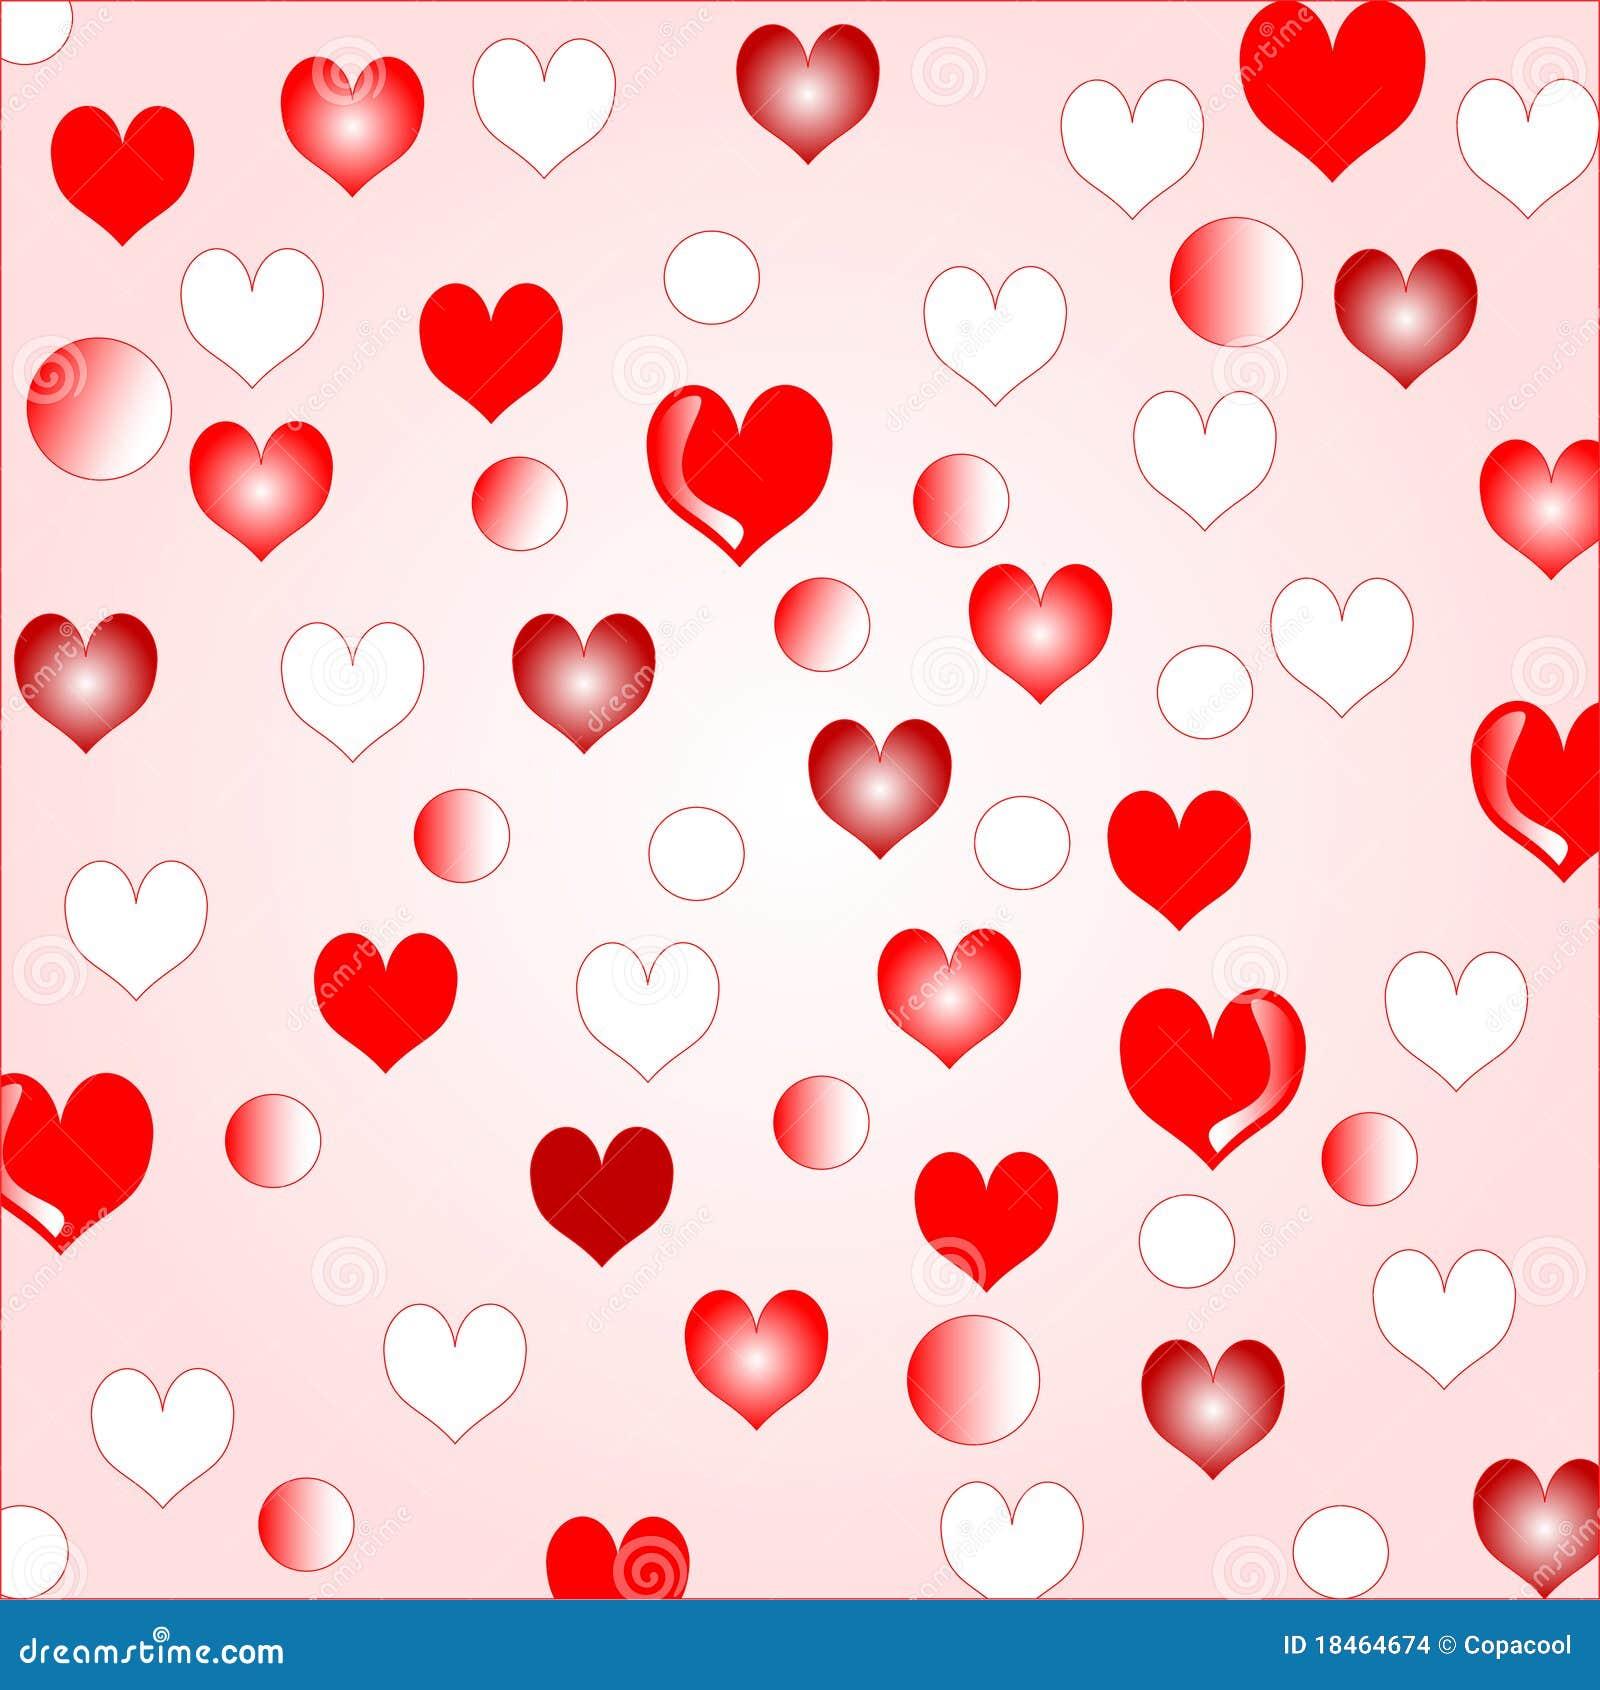 Love Hearts Background Border Design Stock Vector - Illustration of ...